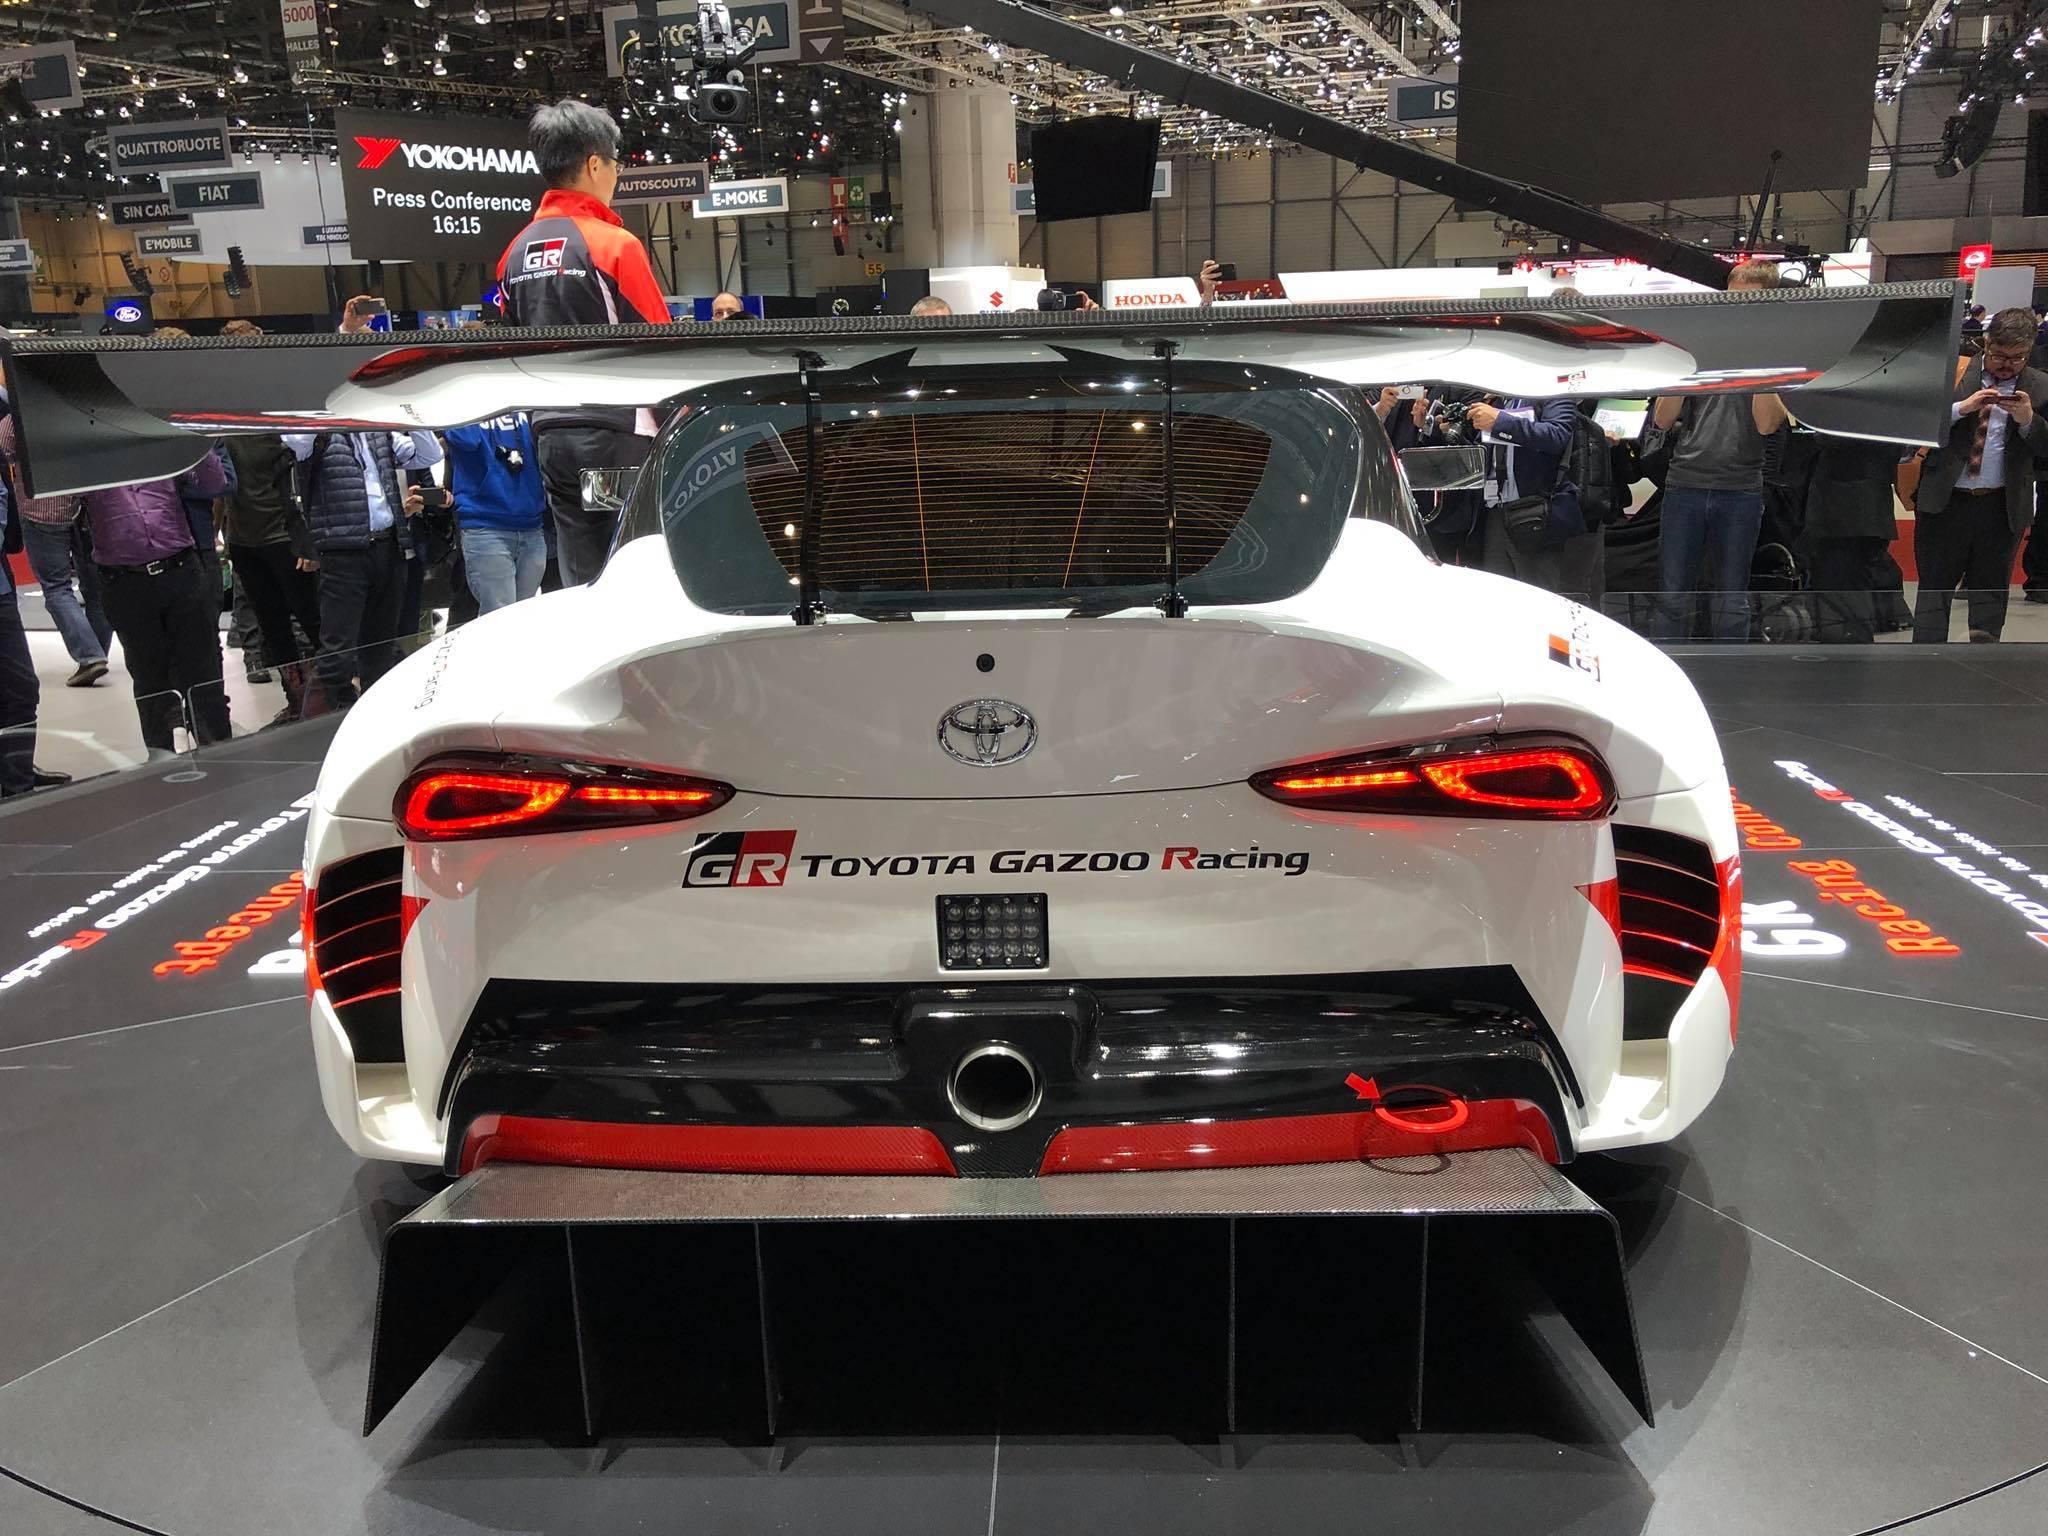 Toyota GR Supra Racing Concept (1)